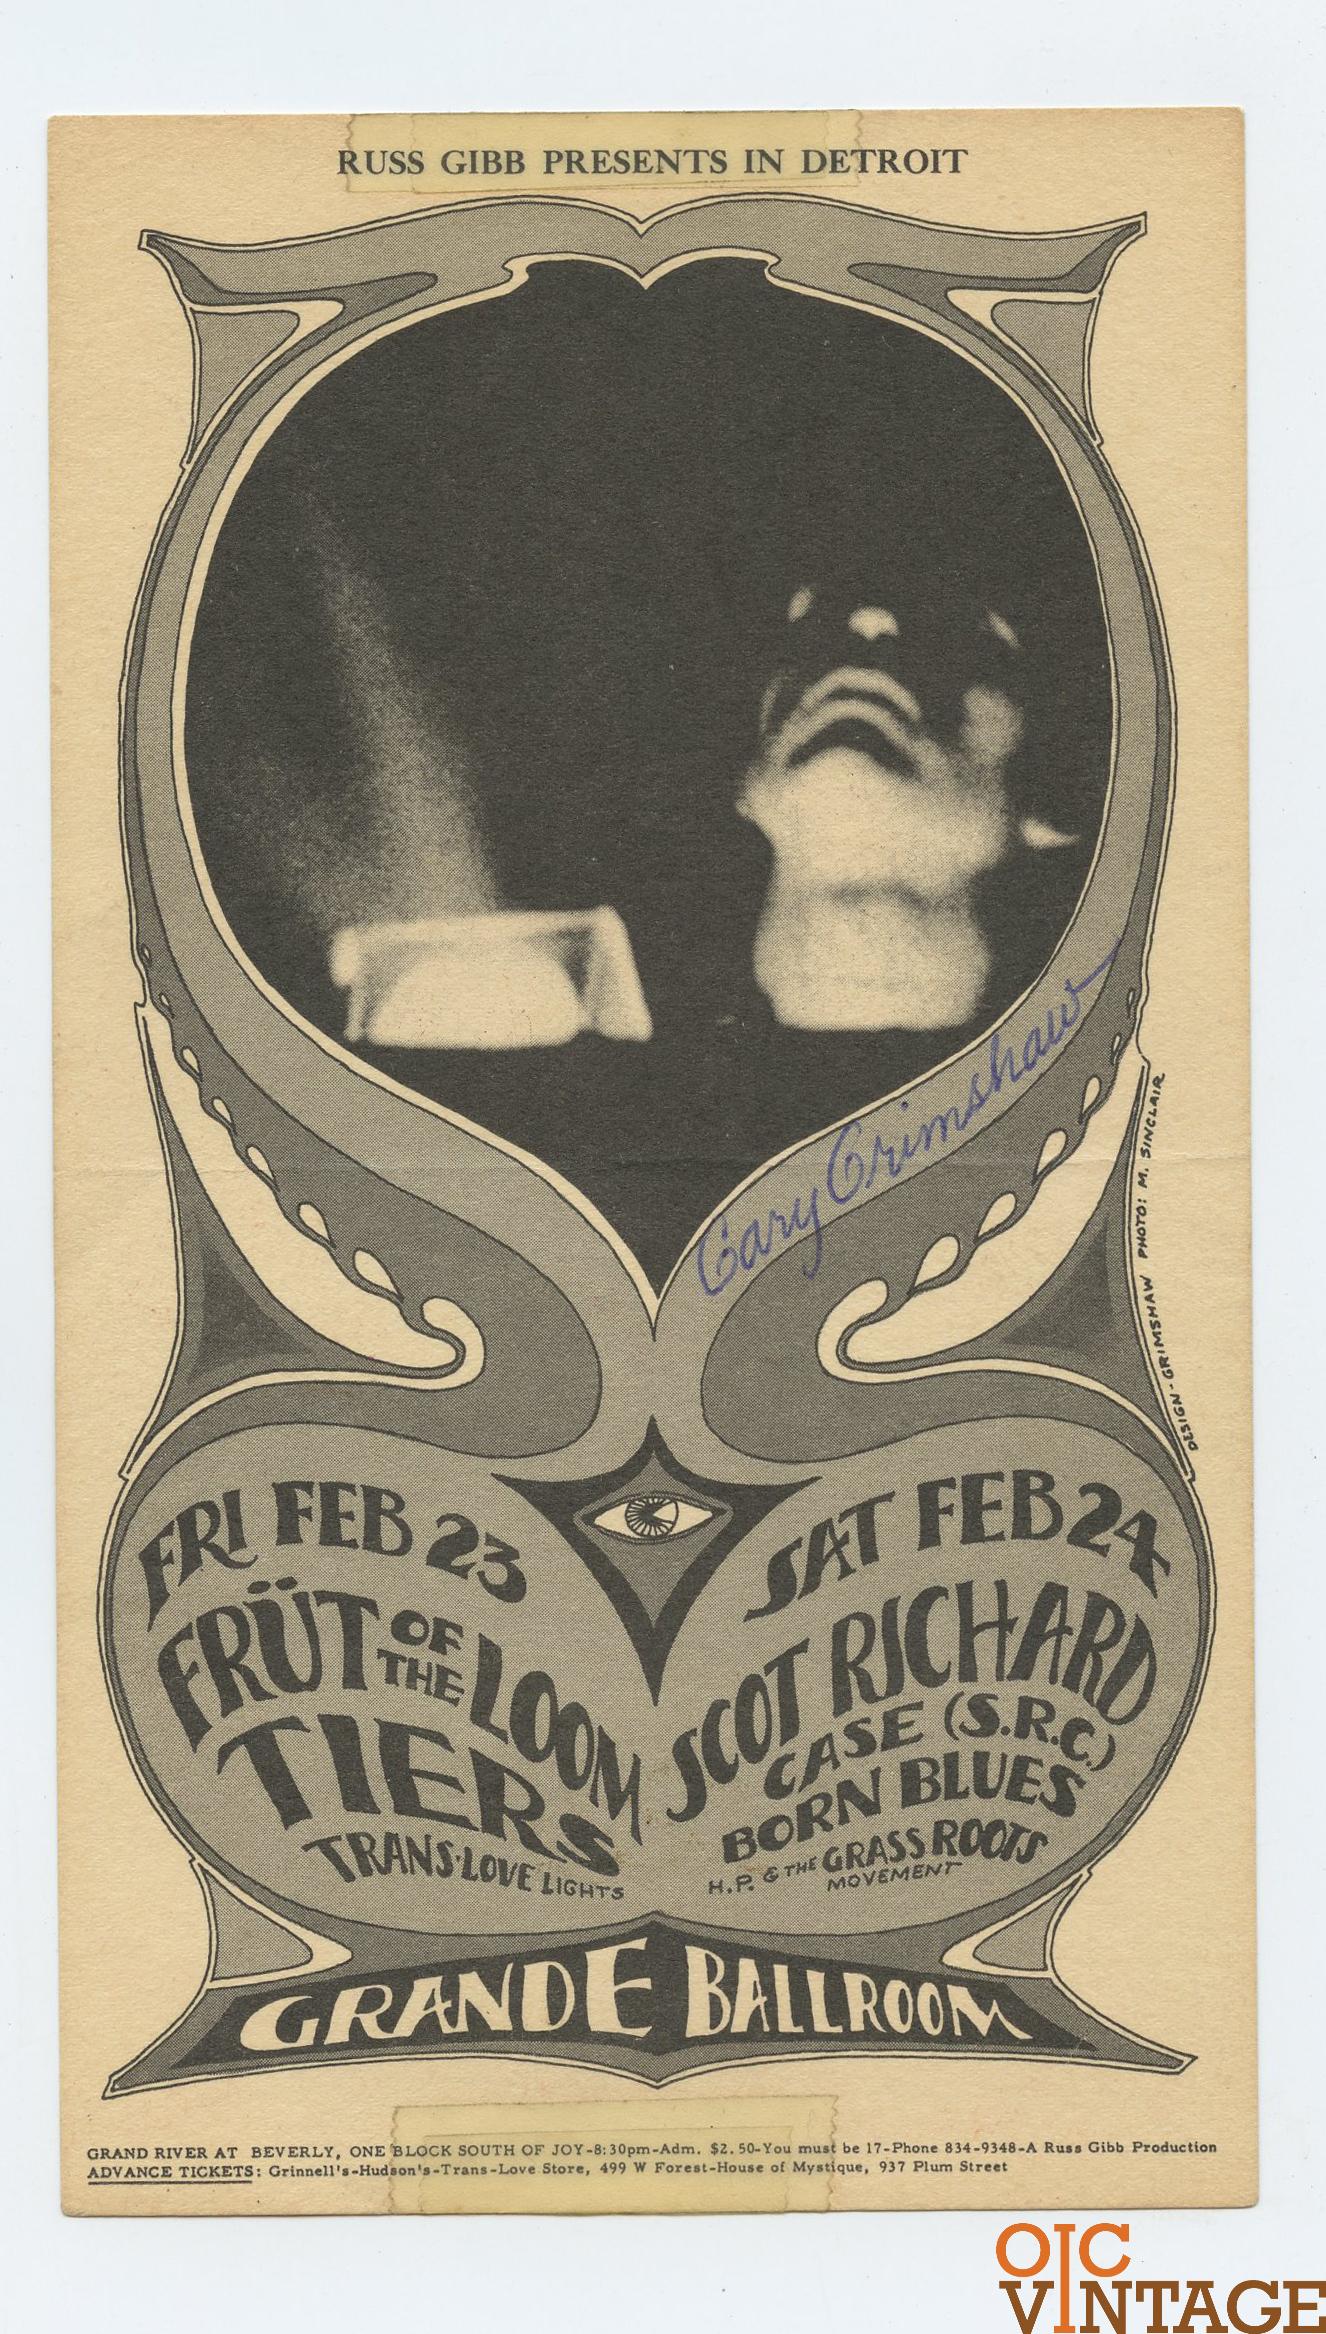 Grande Ballroom Postcard 1968 Feb 23 Gary Grimshaw signed